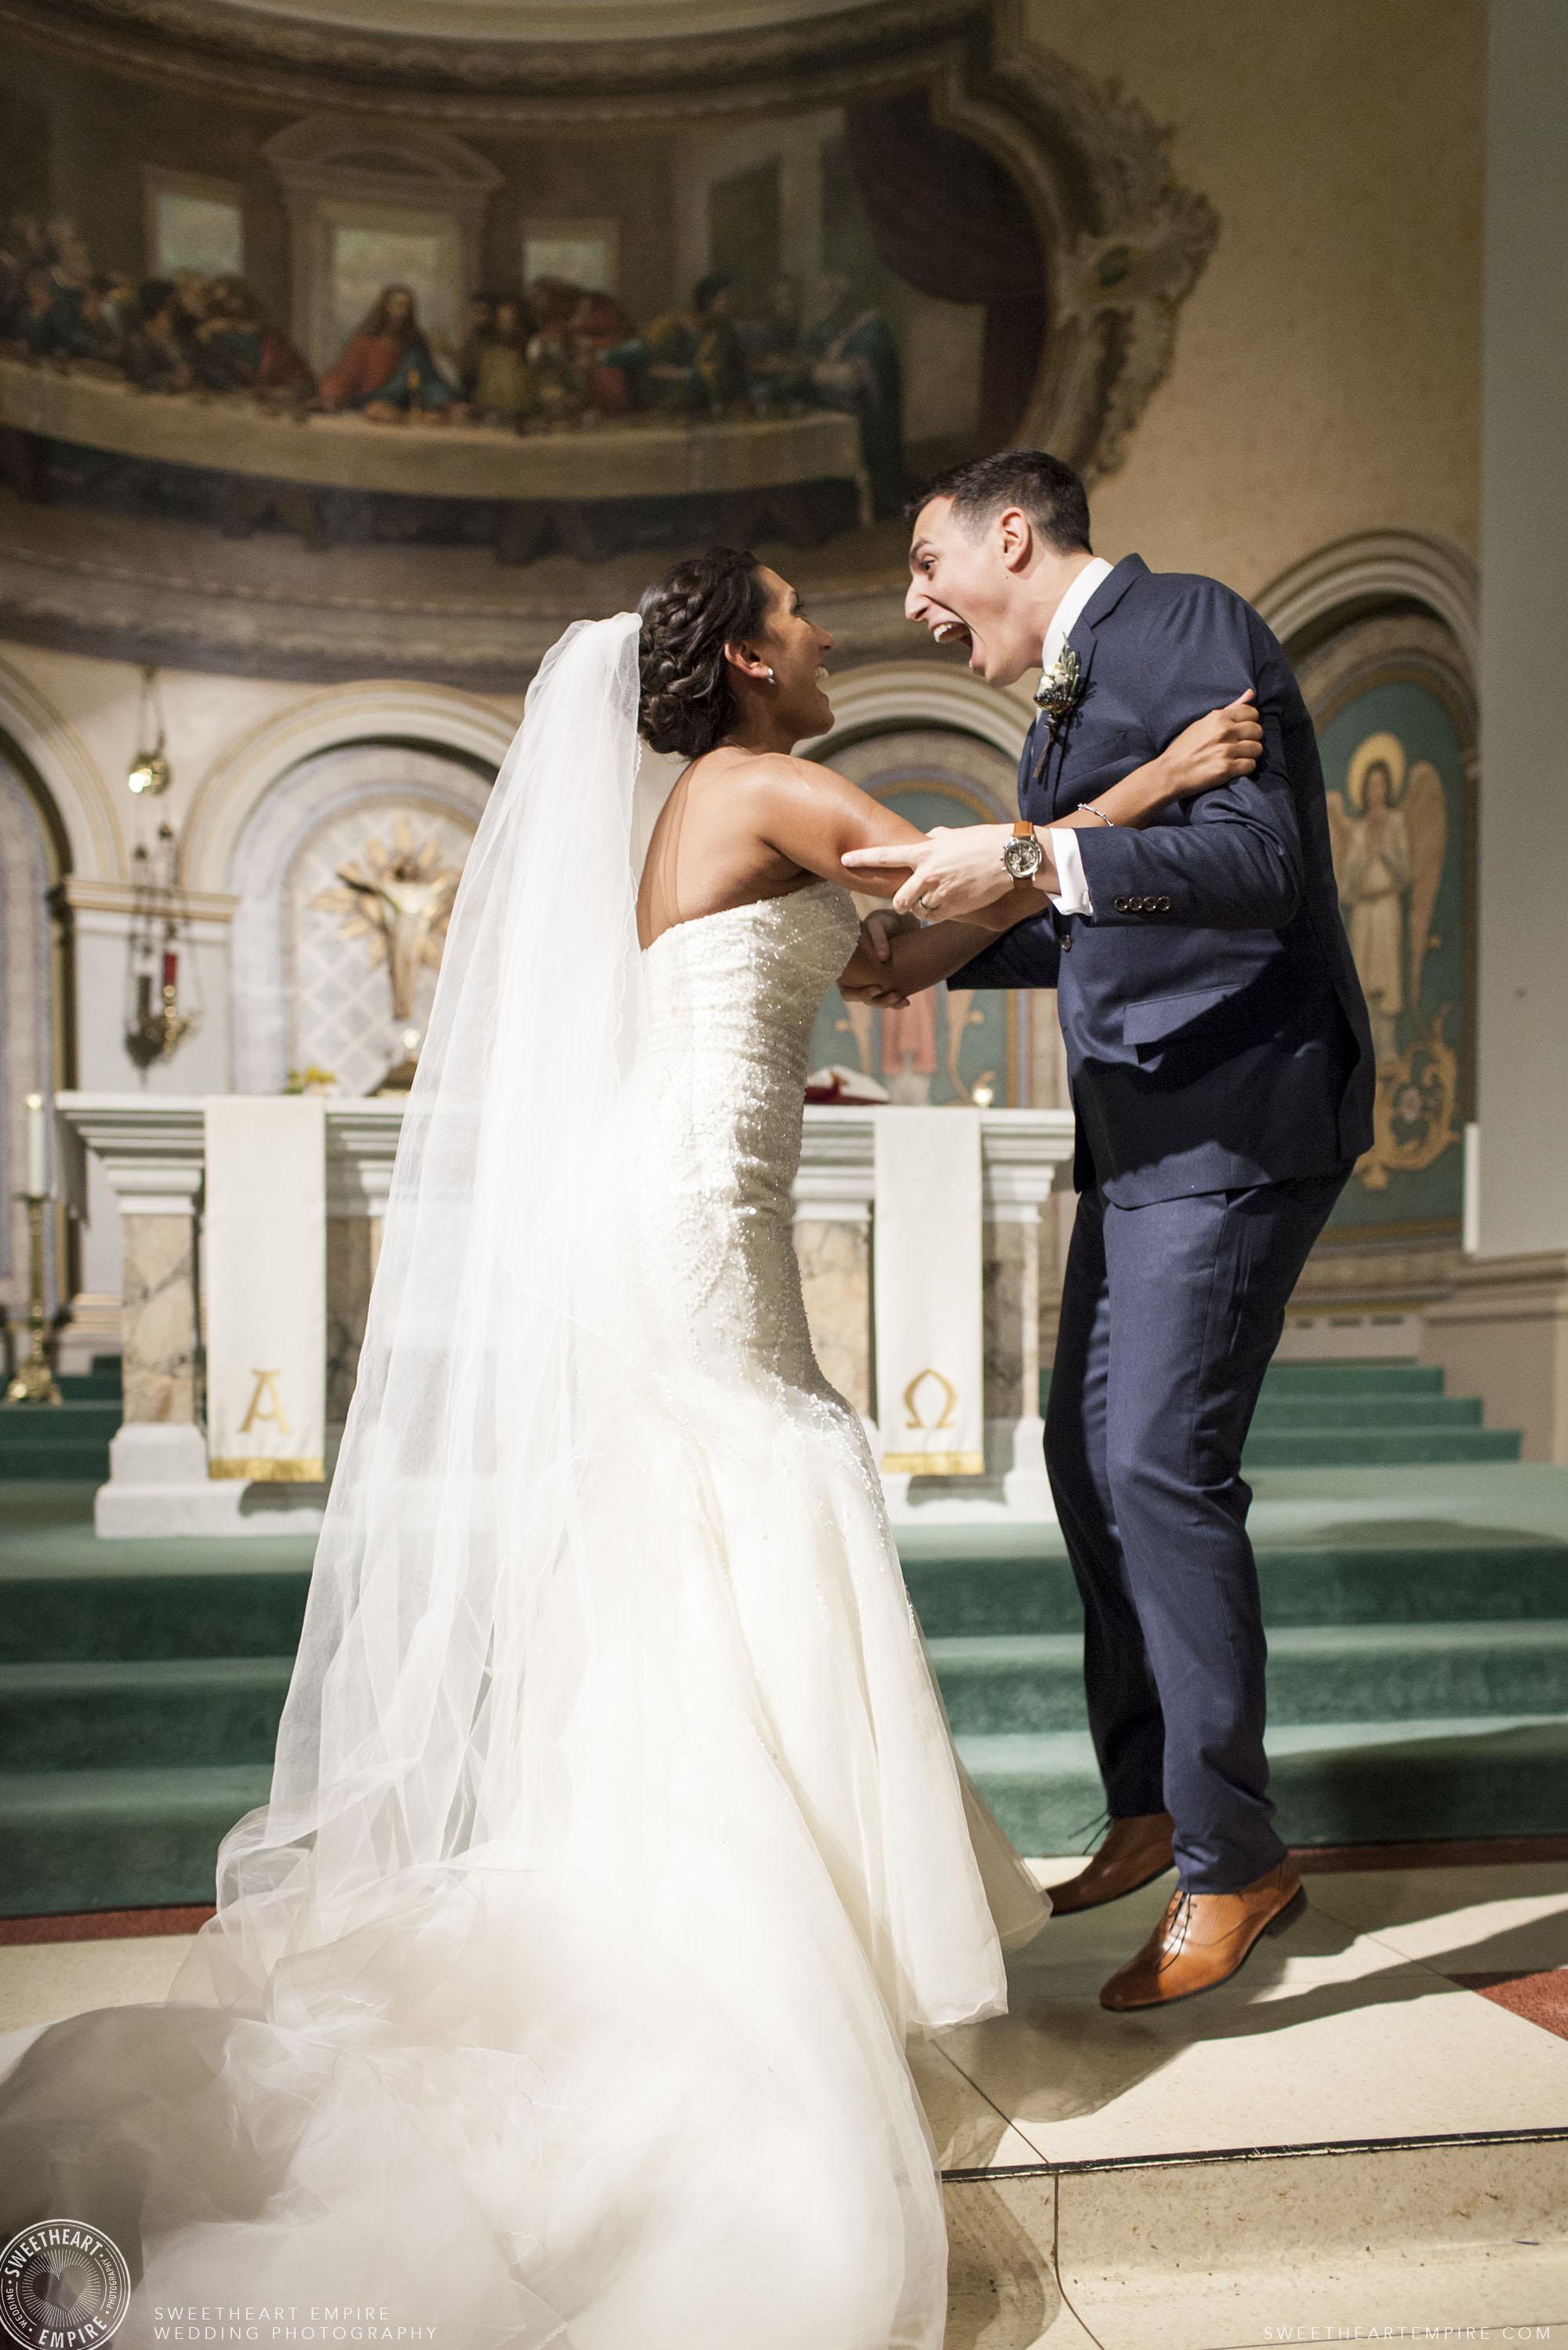 Newlyweds jumping for joy!